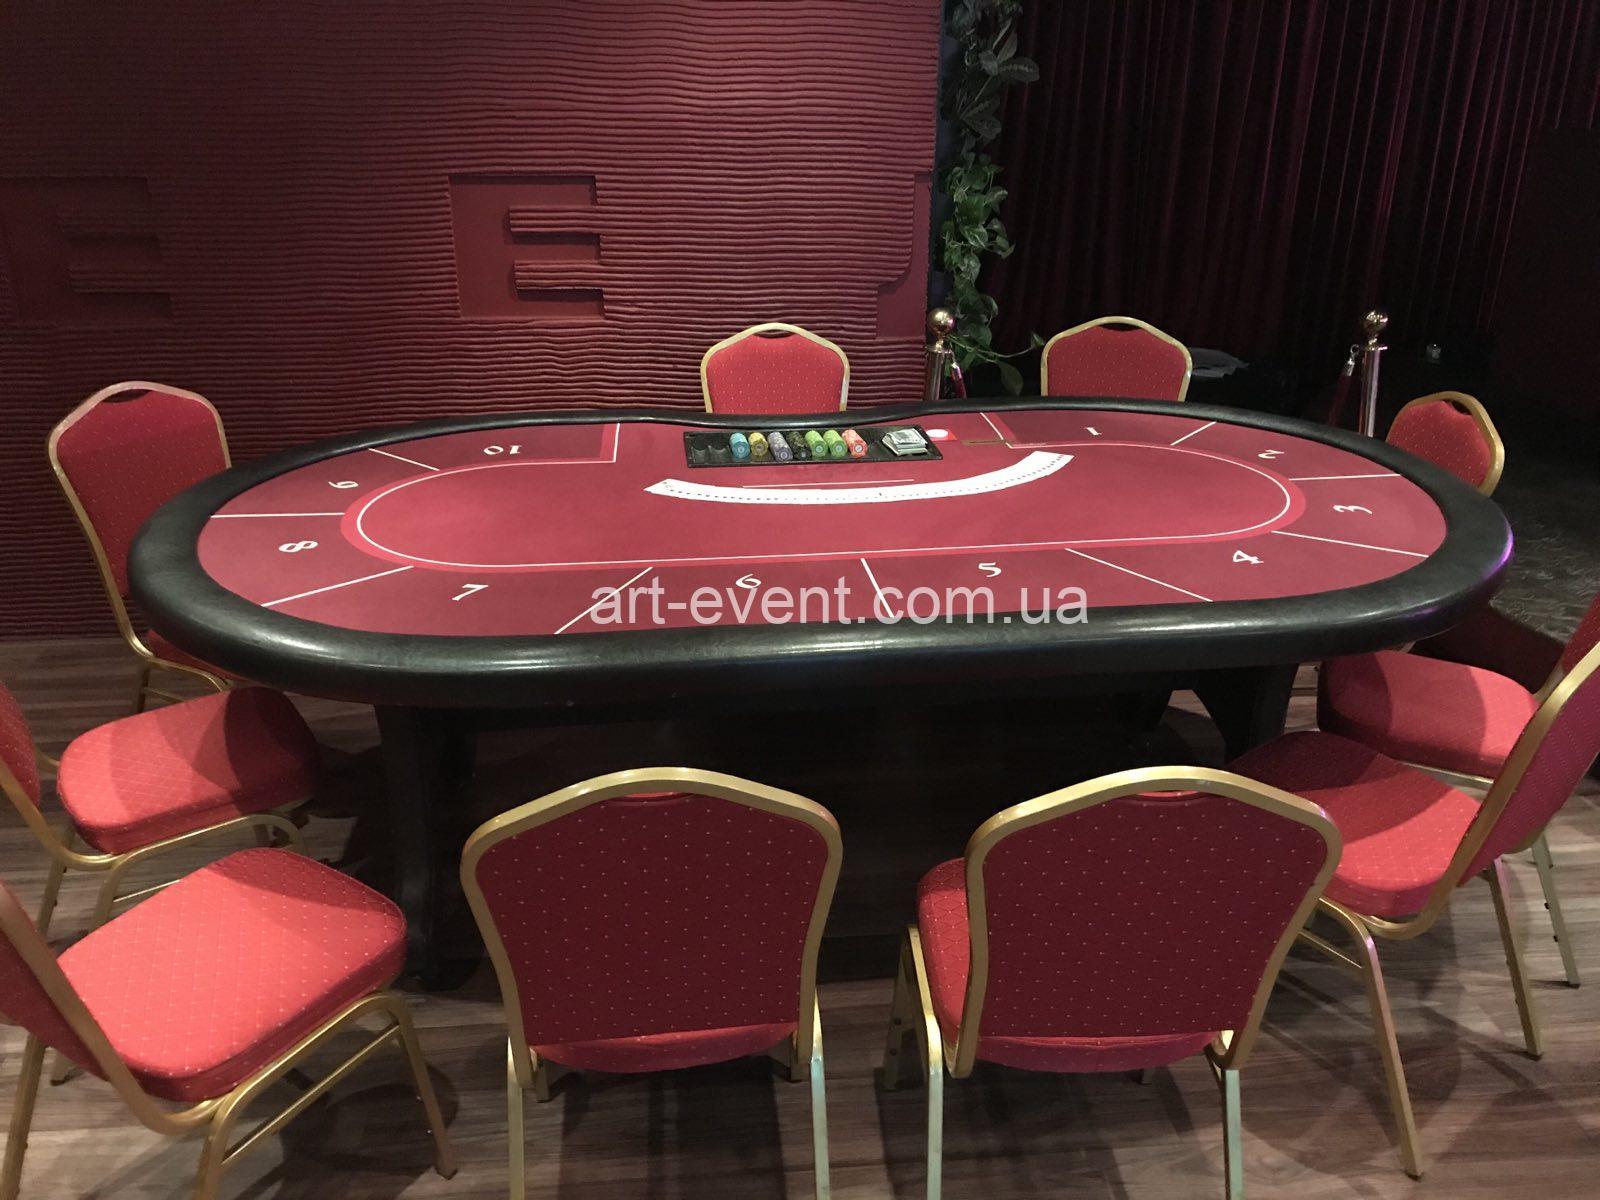 Техасский холдем покер